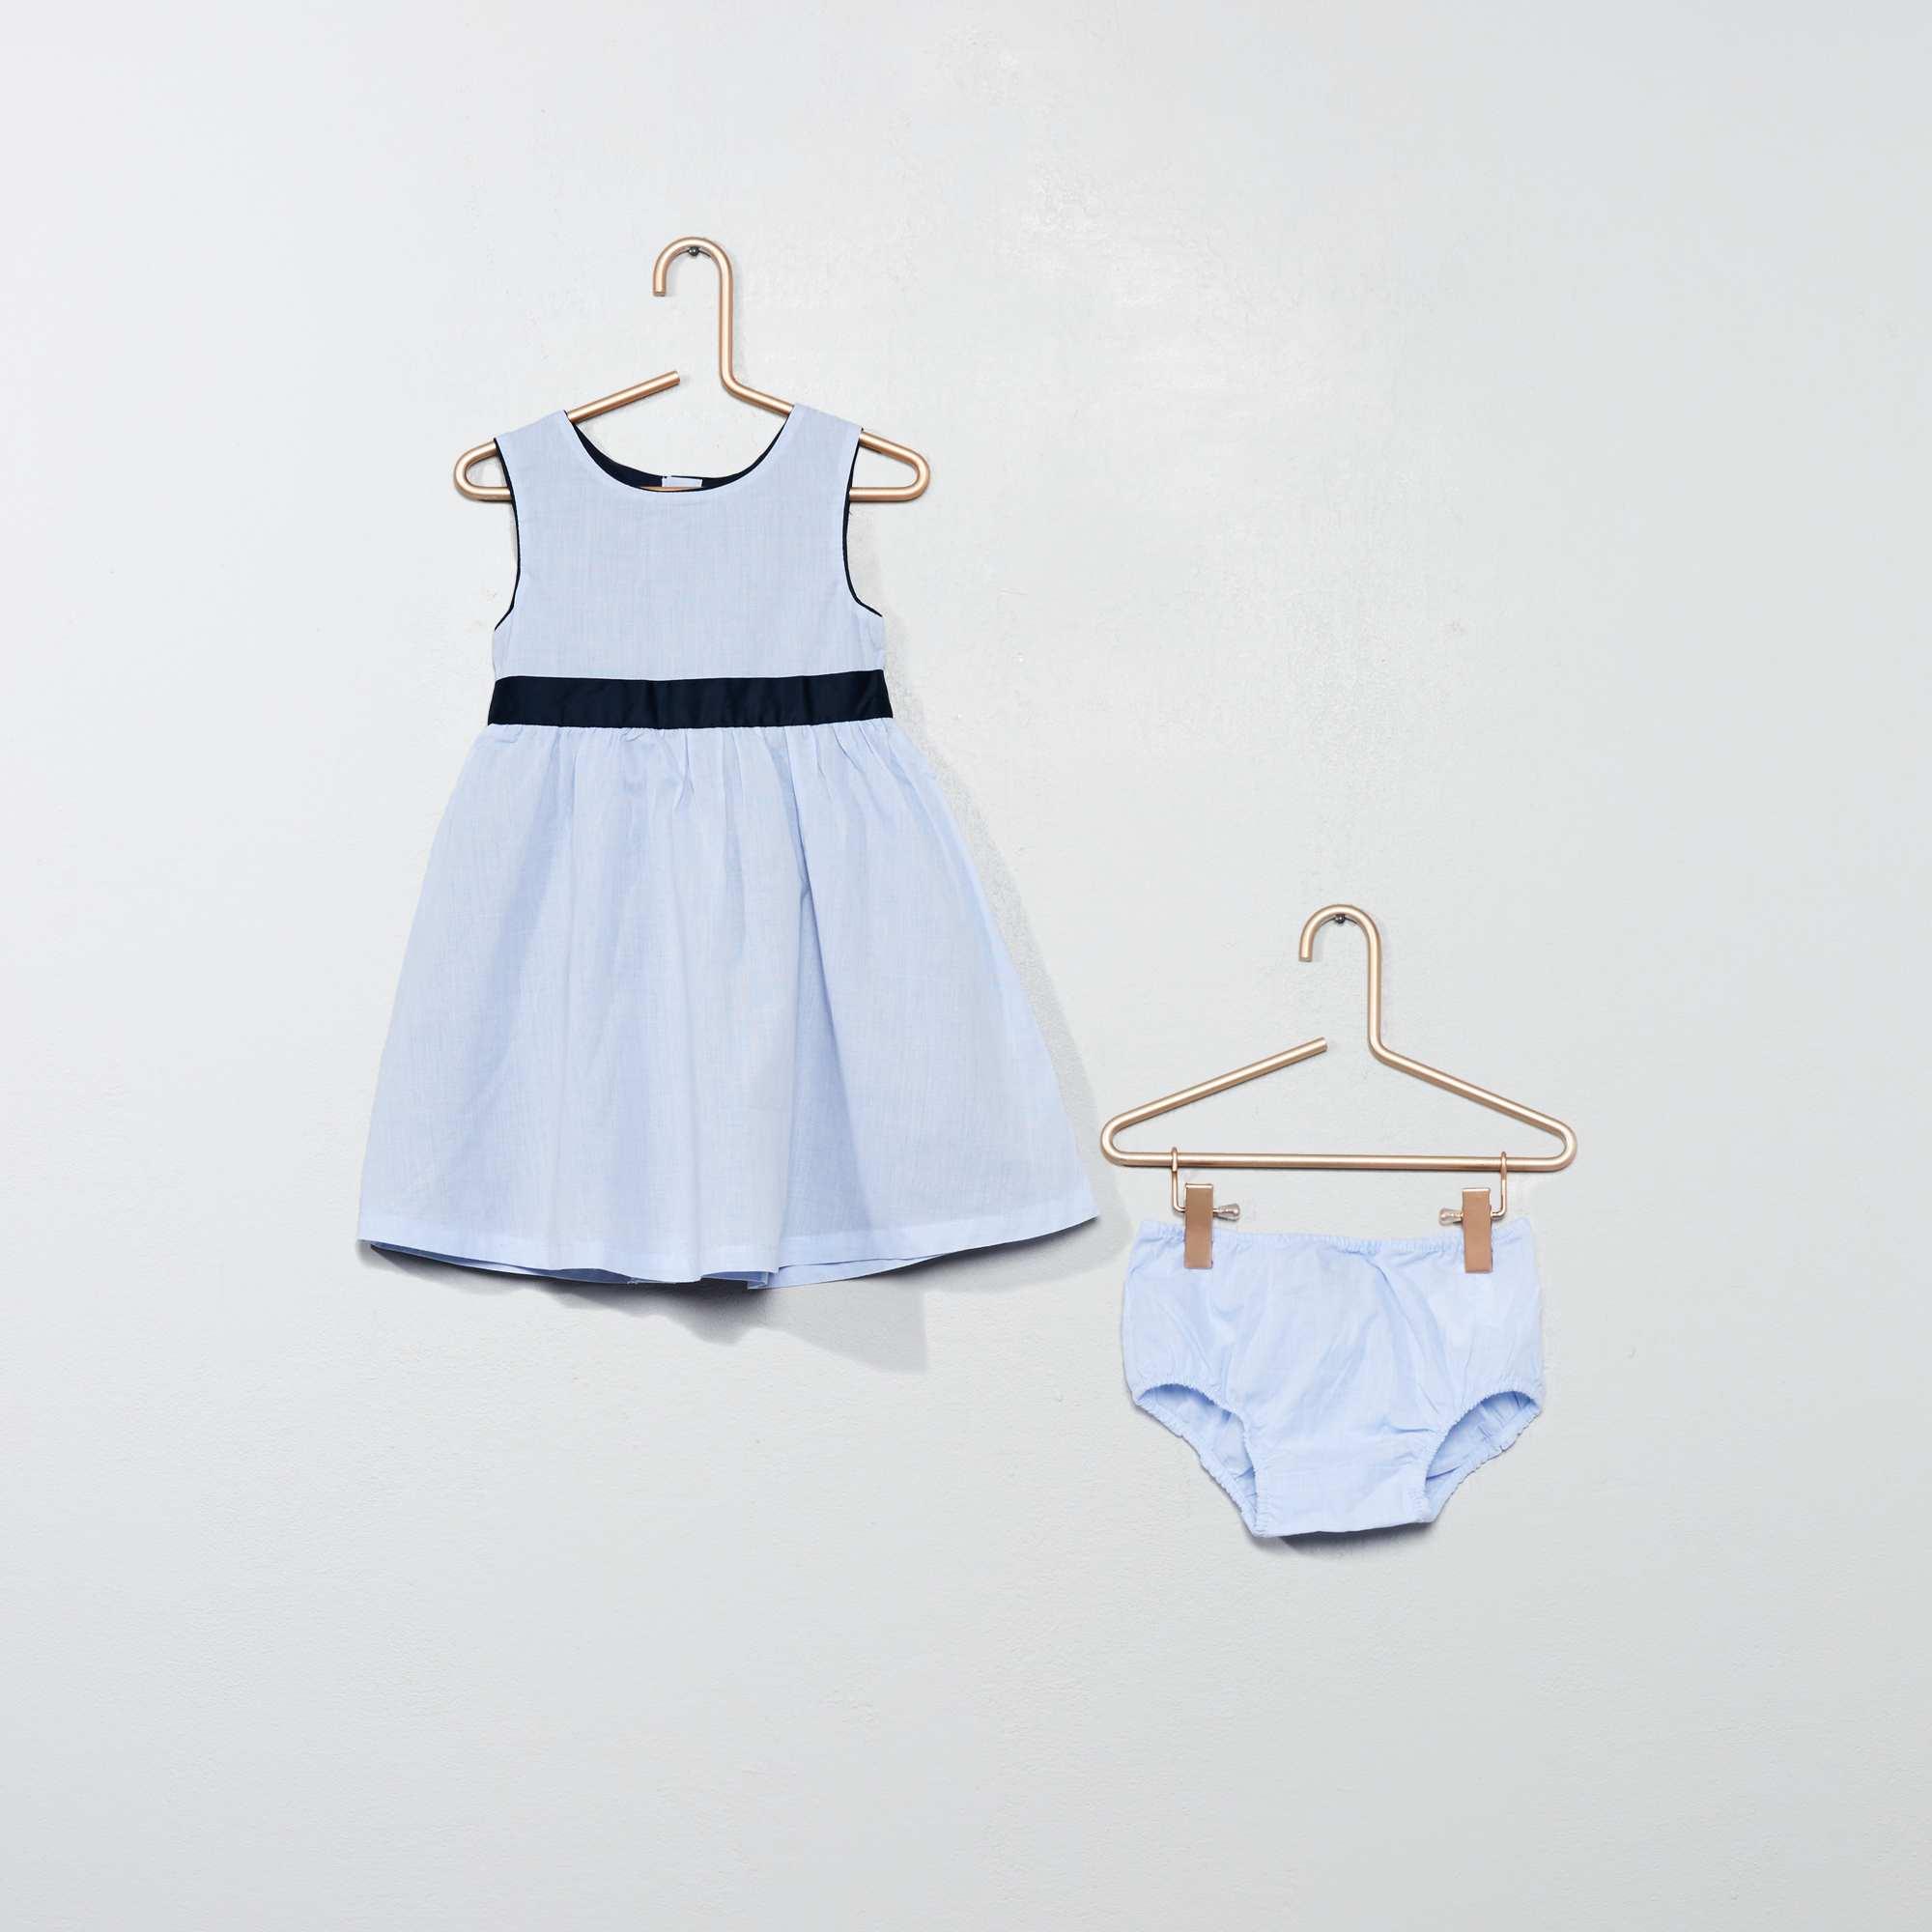 329f3b62442ca Ensemble robe et culotte Bébé fille - bleu - Kiabi - 15